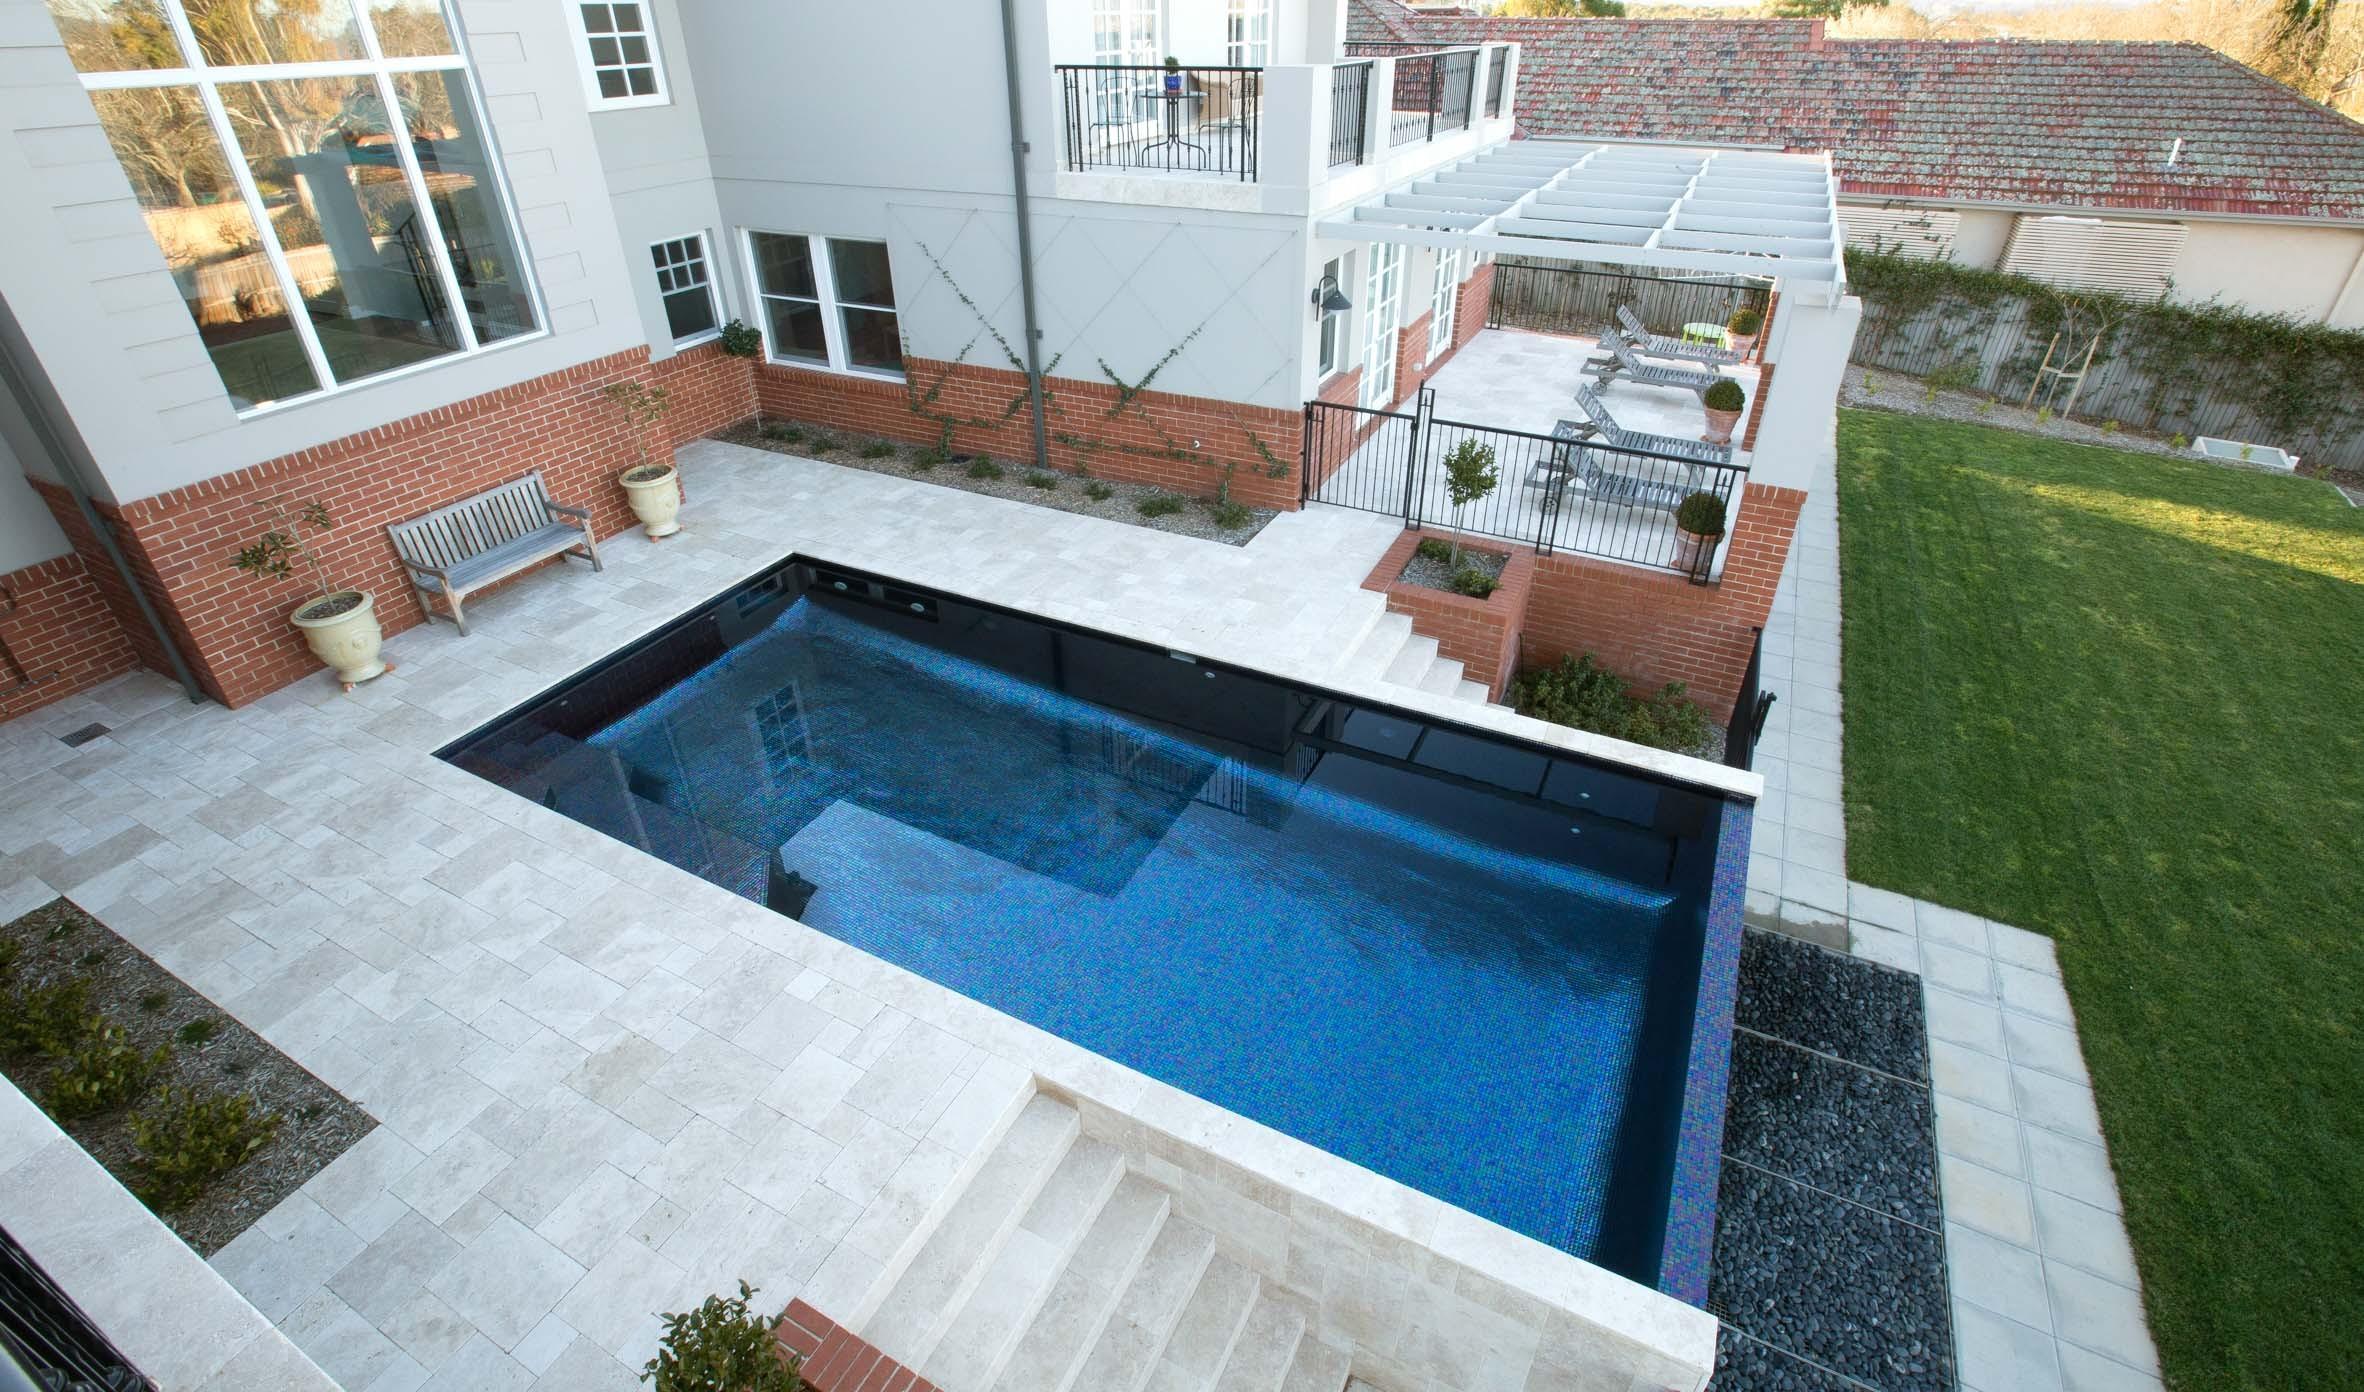 Pool-Tiles Thumbnails pool-tiles-29